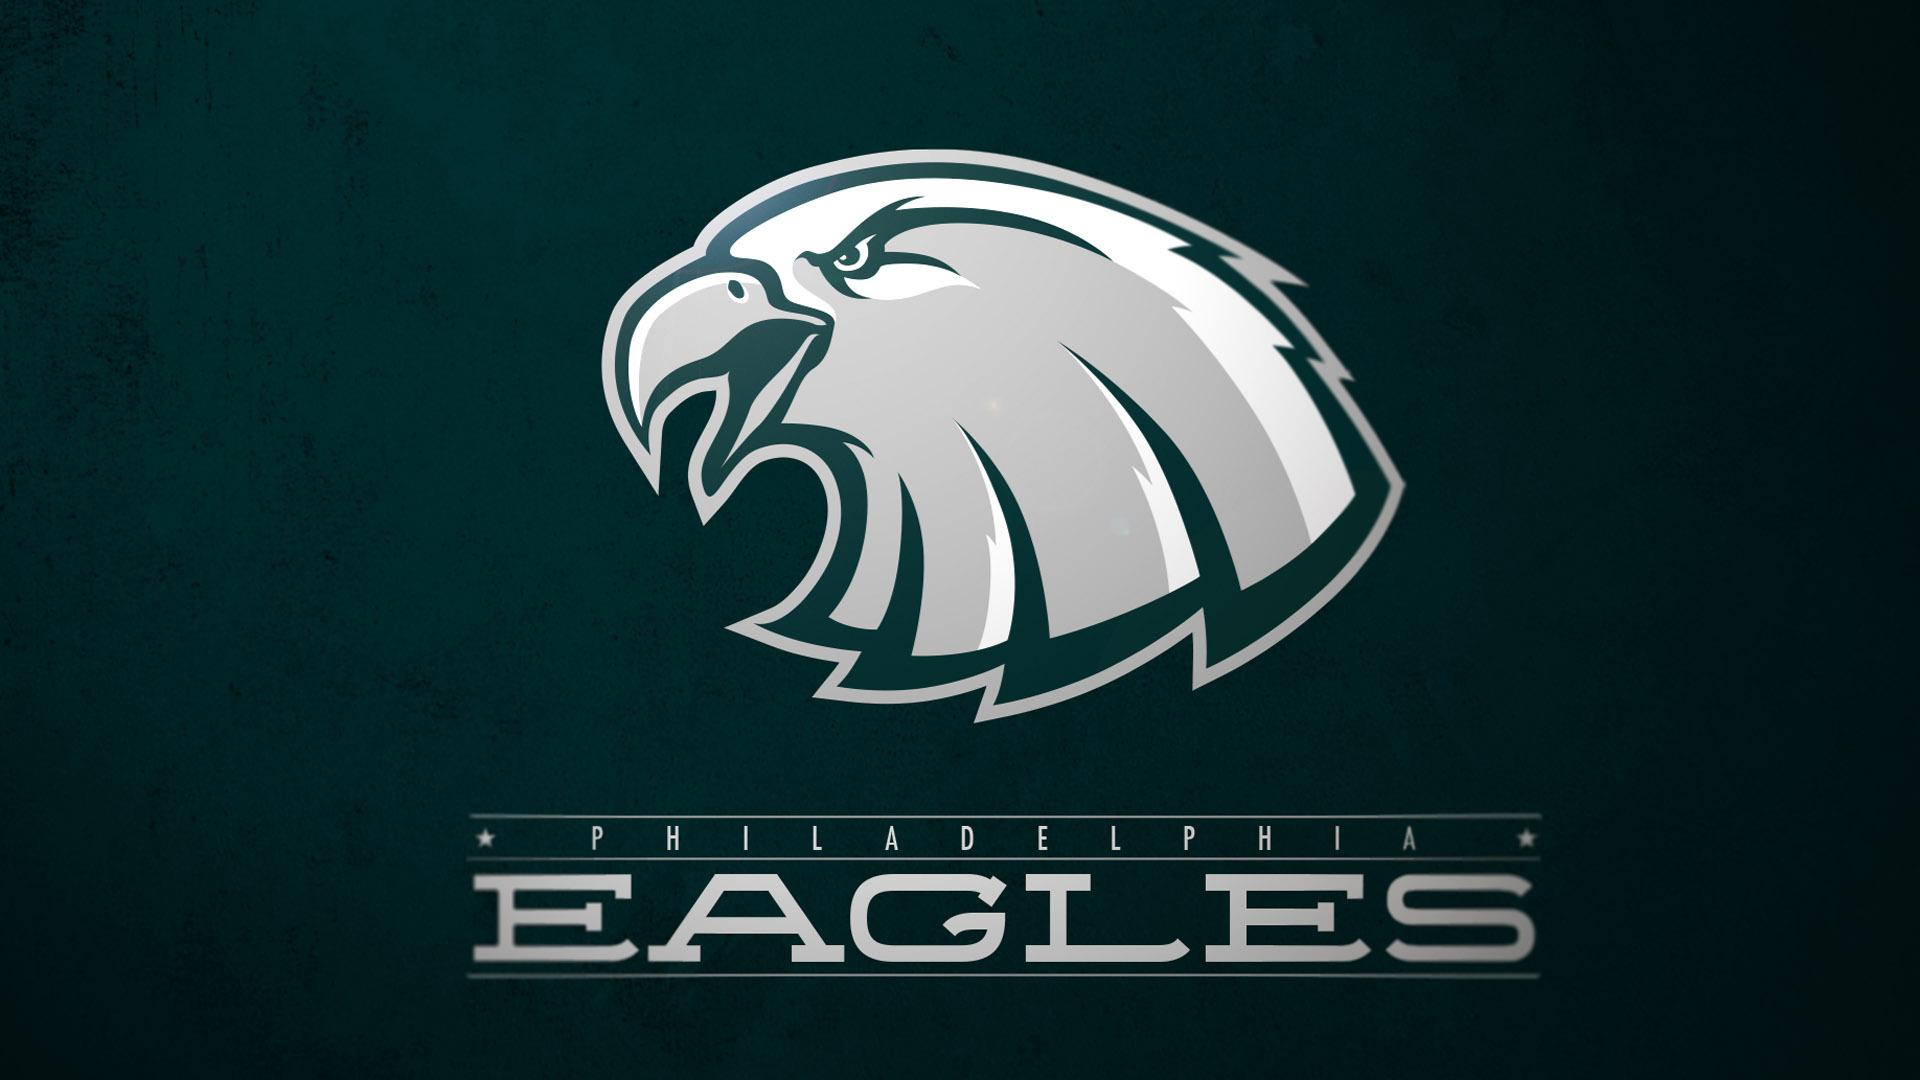 Philadelphia Eagles Hd Background